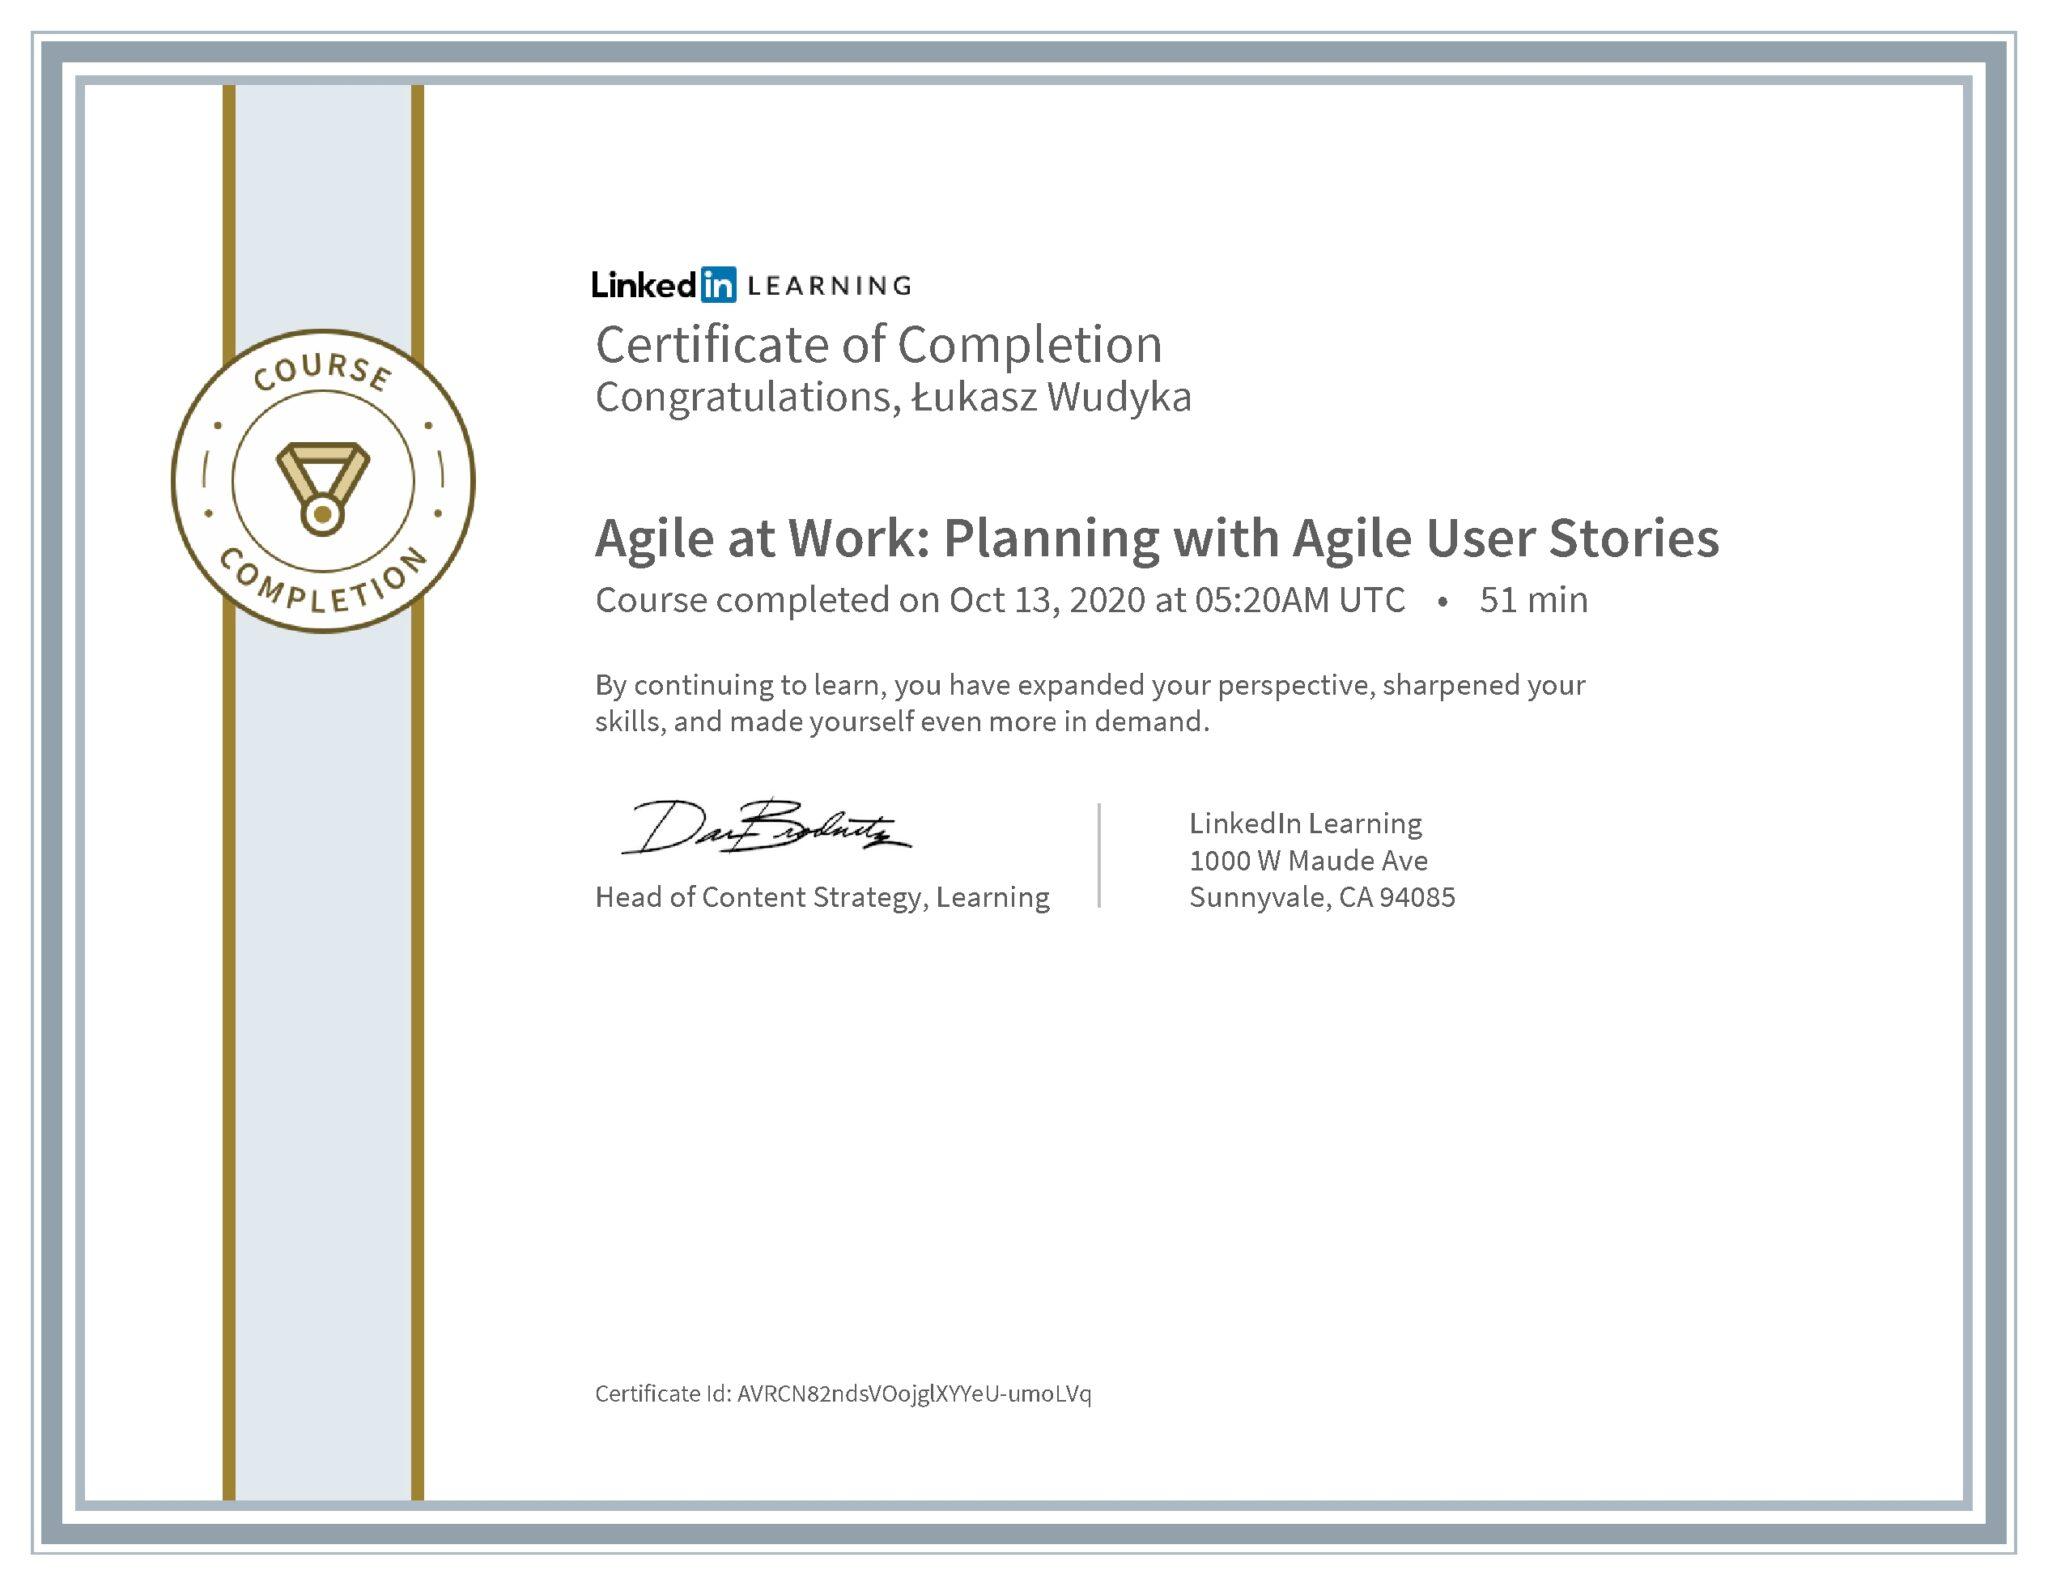 Łukasz Wudyka certyfikat LinkedIn Agile at Work: Planning with Agile User Stories